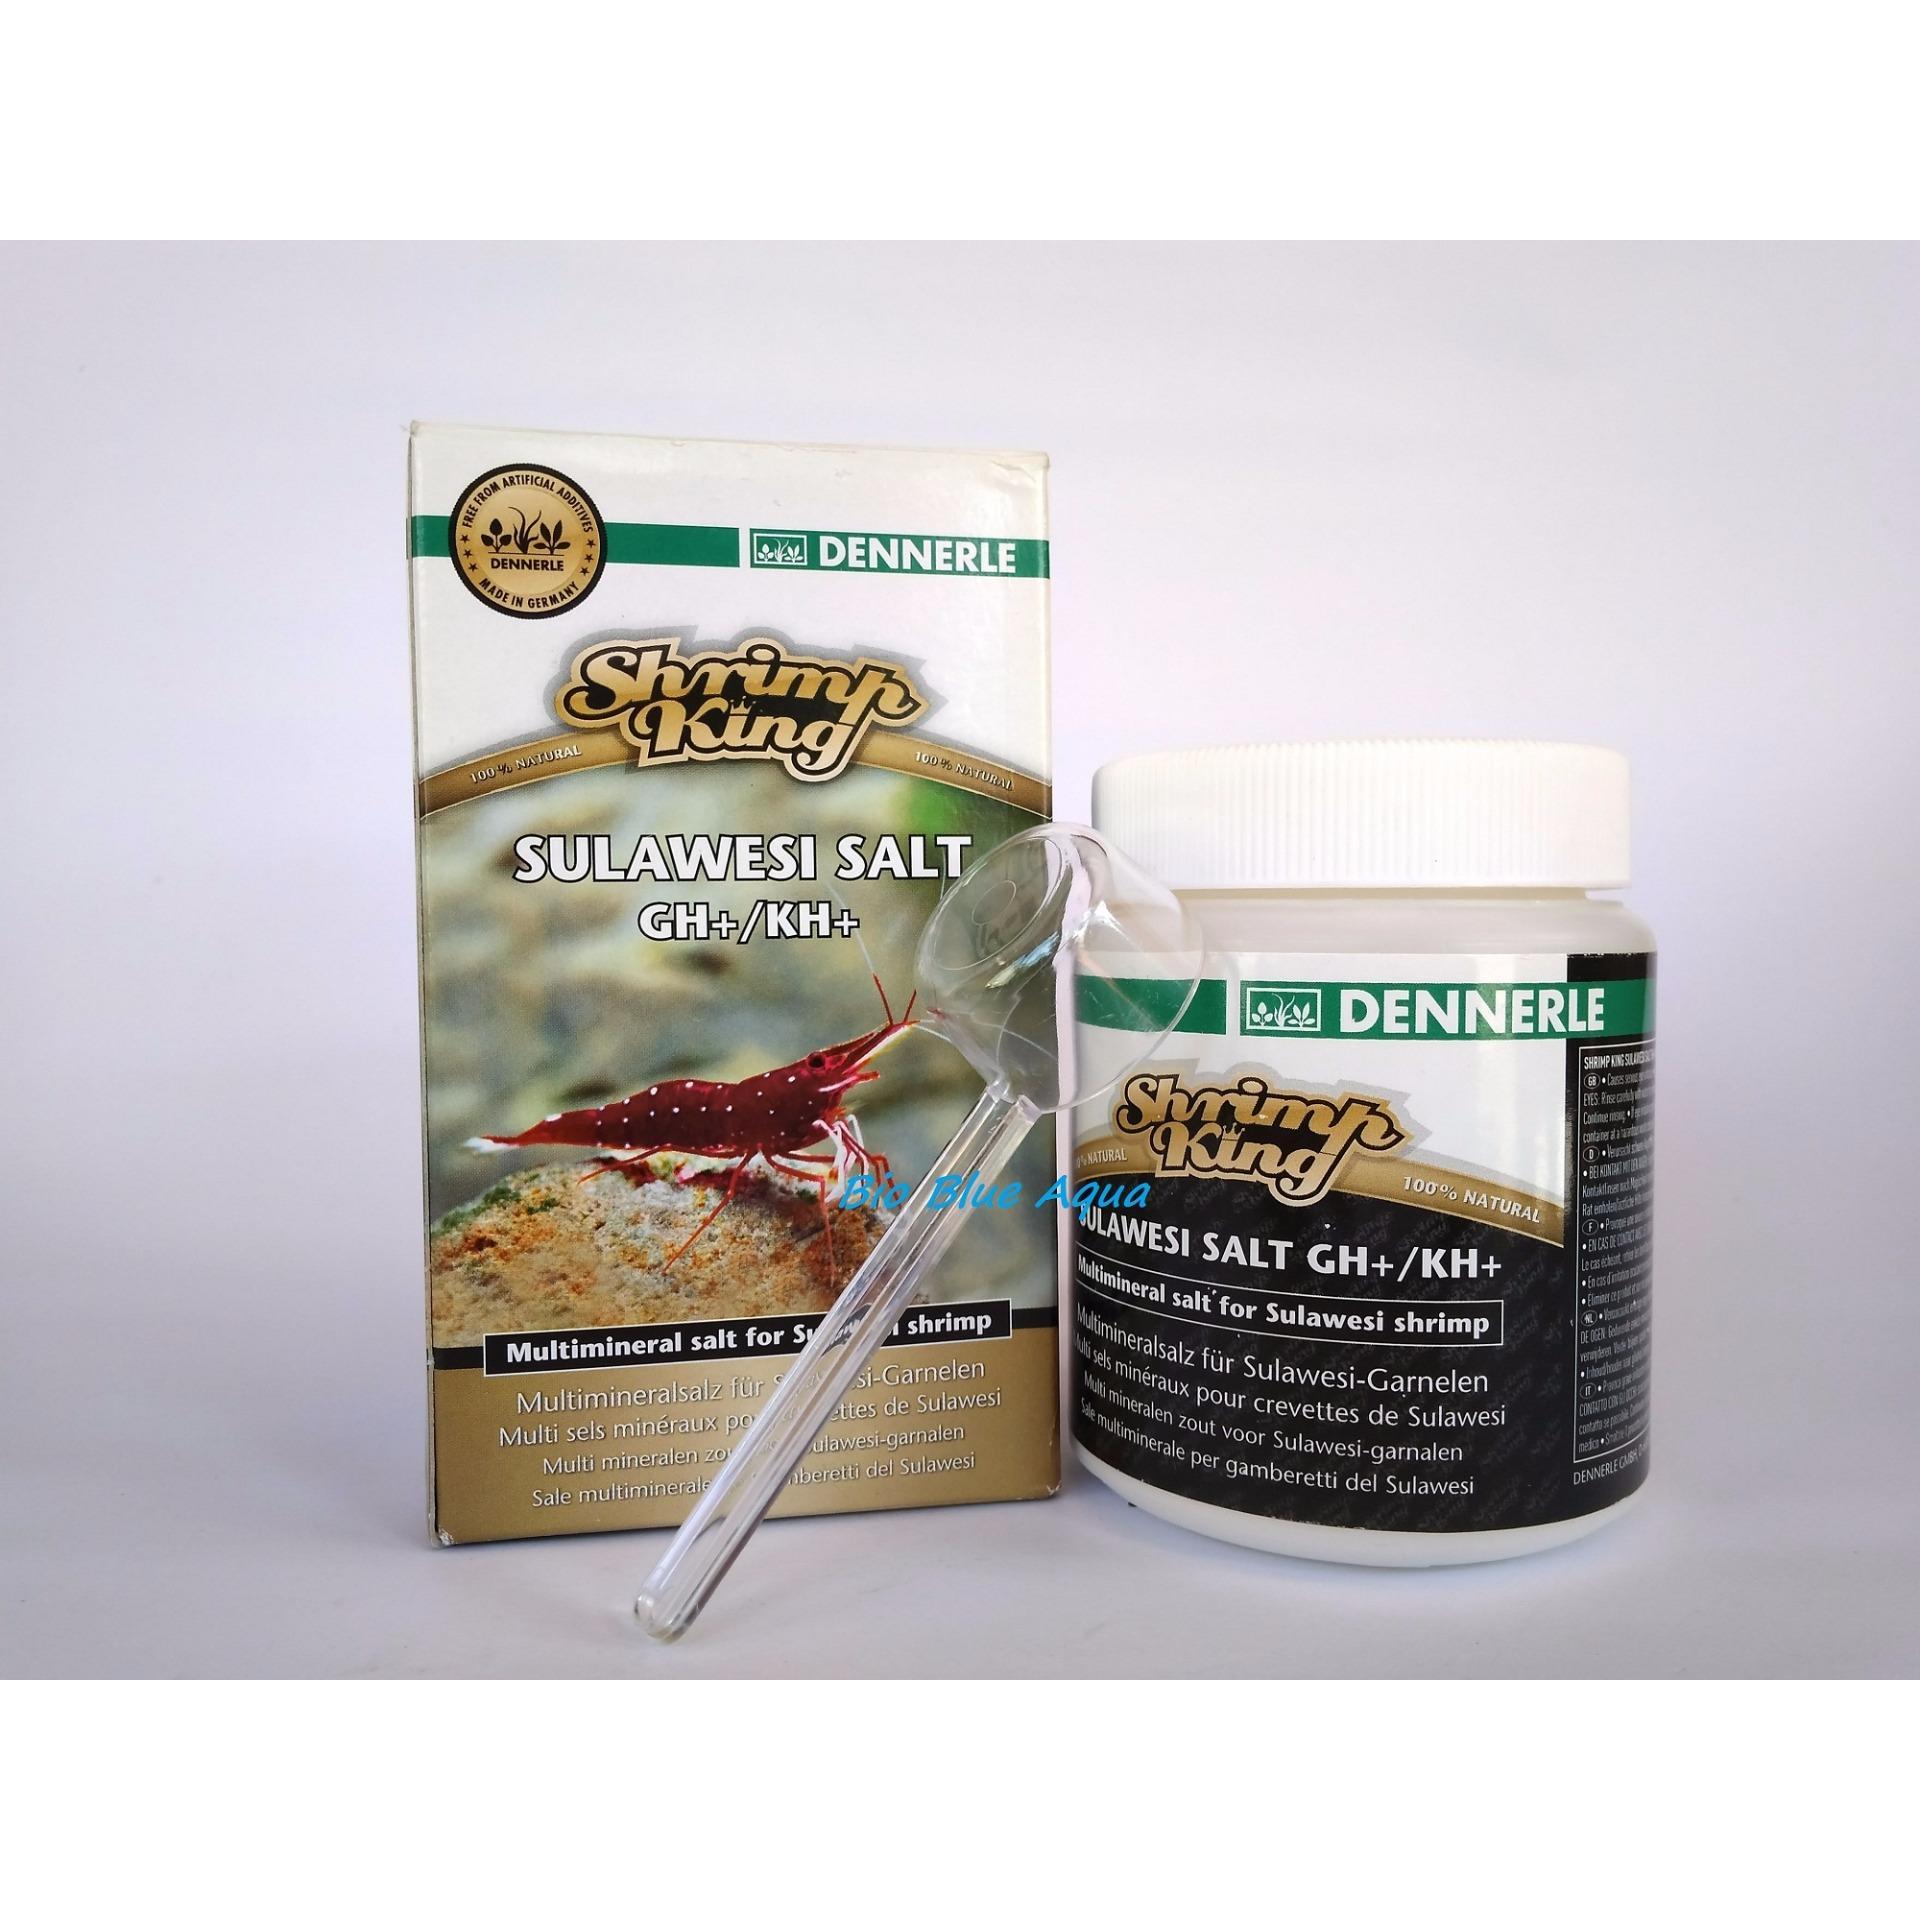 Dennerle Shrimp King Sulawesi Salt